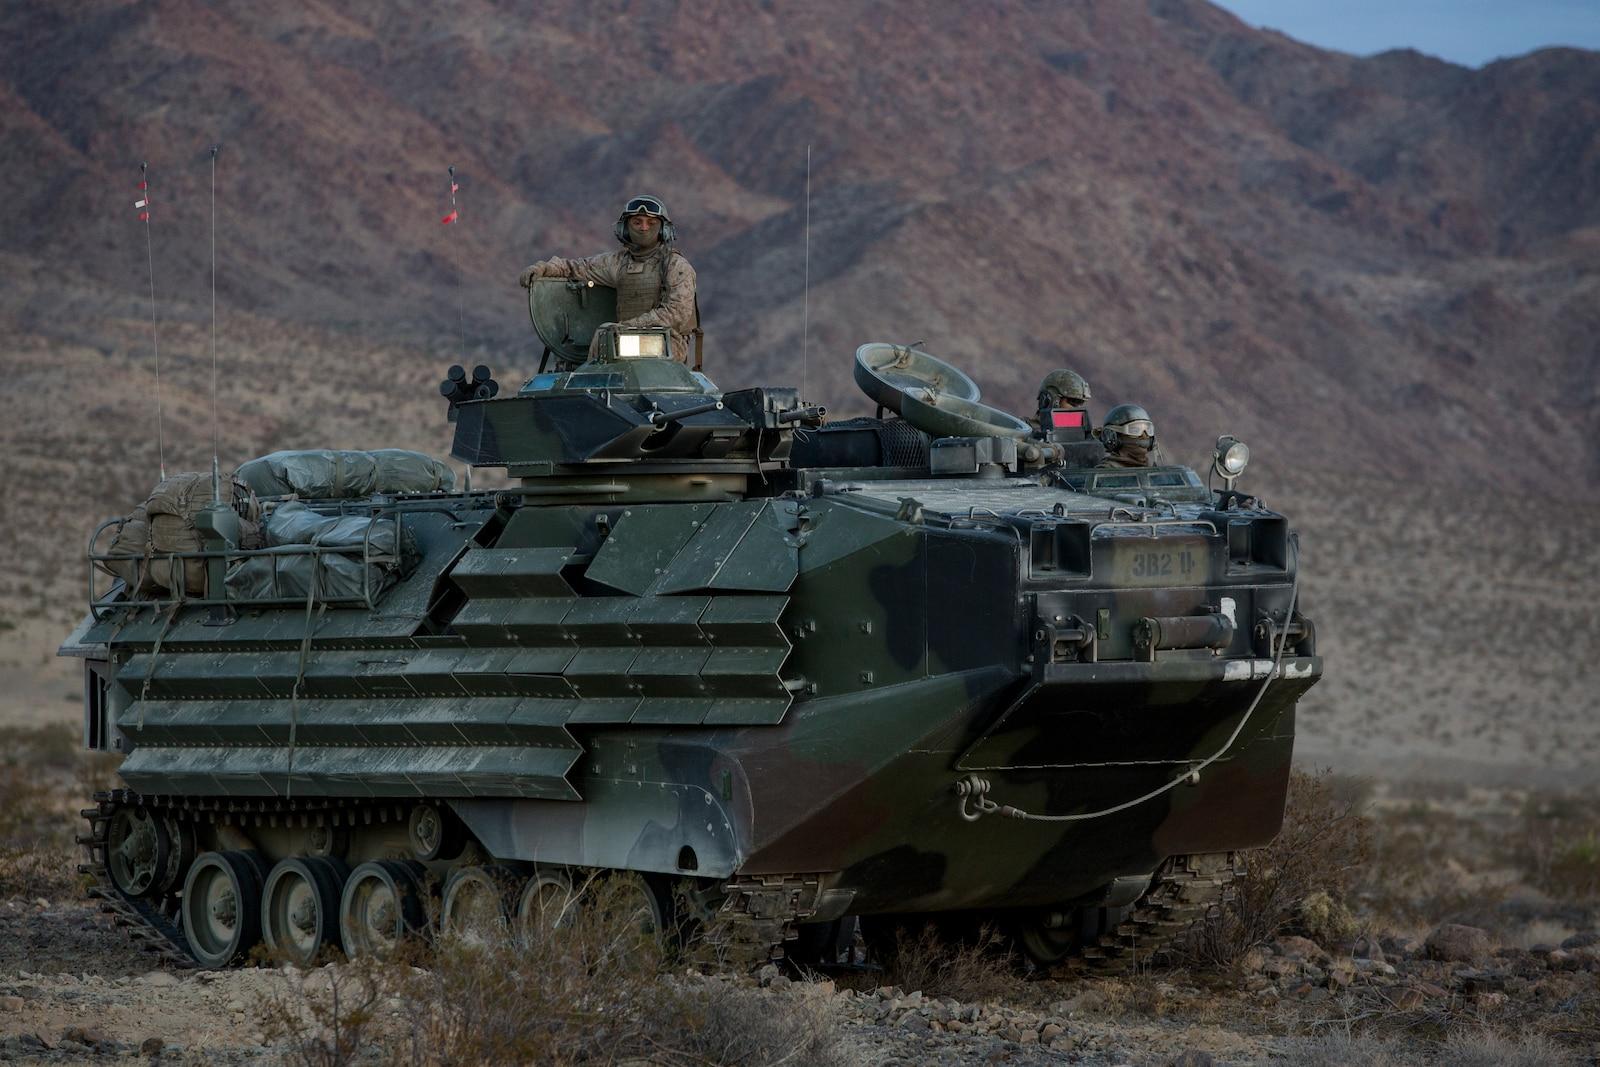 U.S. Marines with 3rd Battalion, 7th Marine Regiment, 1st Marine Division, utilize amphibious assault vehicles during a Marine Corps Combat Readiness Evaluation (MCCRE) at Marine Corps Air Ground Combat Center, Twentynine Palms, Calif., Nov. 29, 2017.